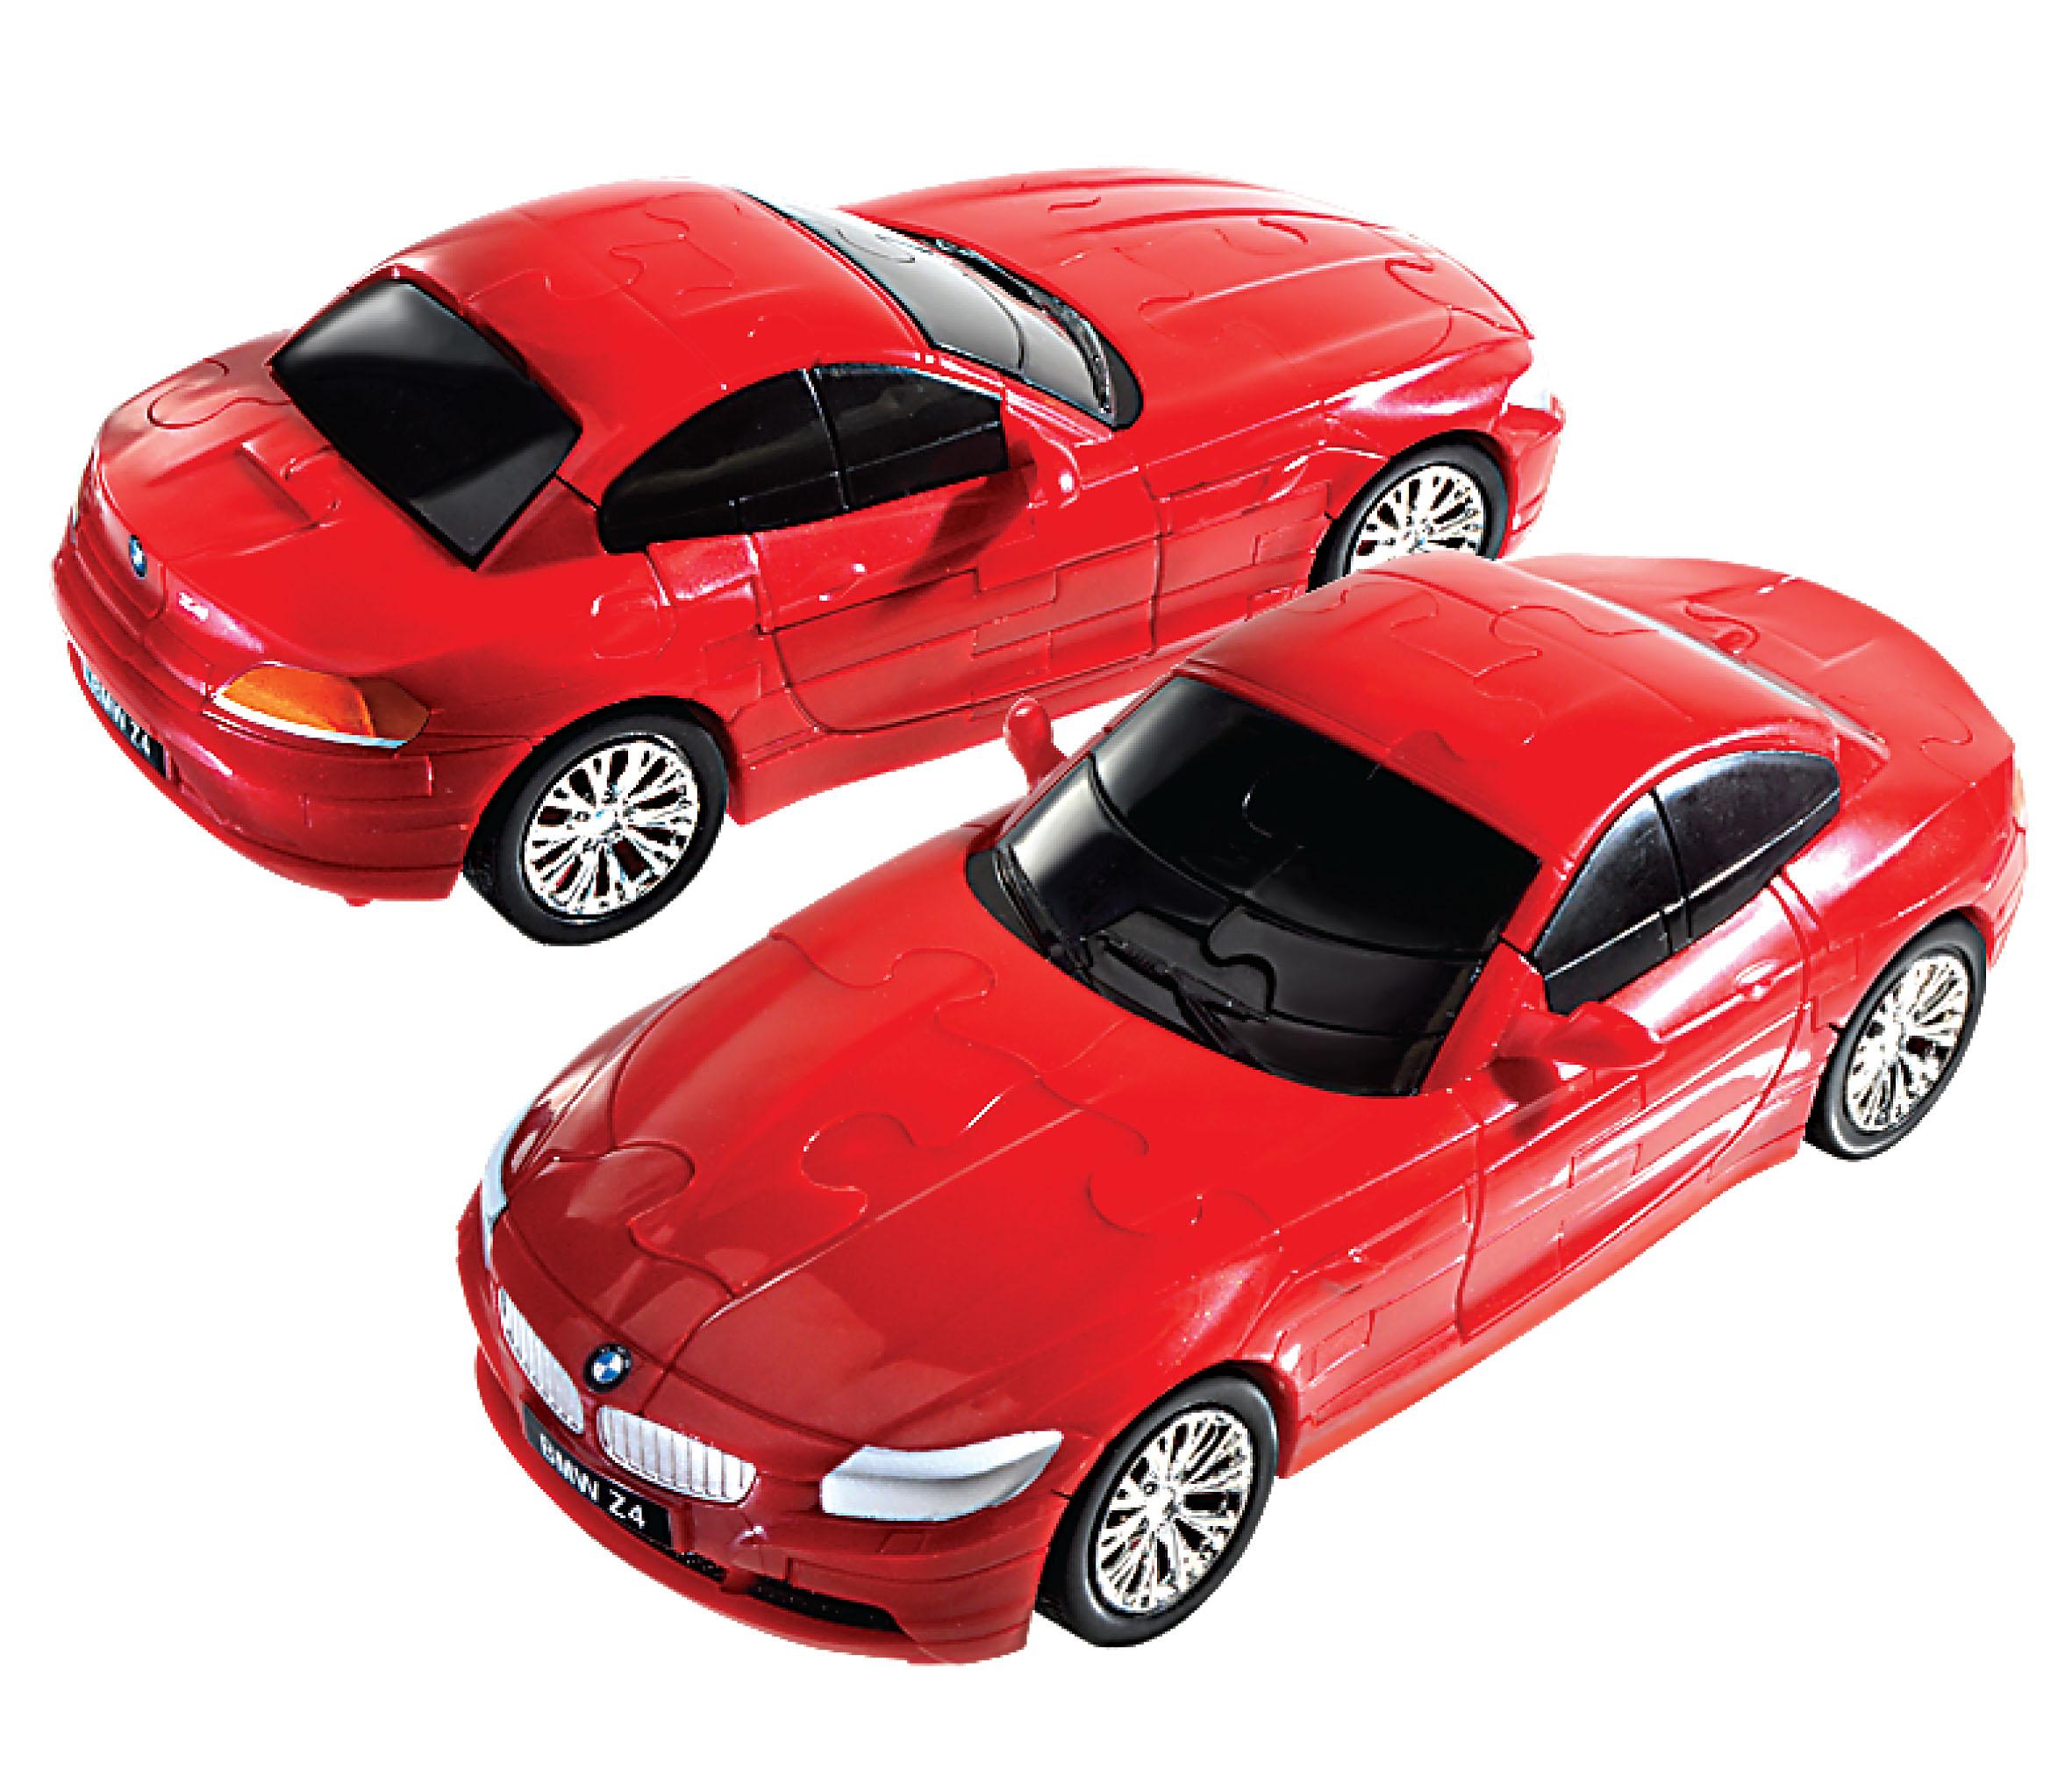 Bmw Z 2015: 3Д Пазл БМВ Z4 красный, матовый / 3D Puzzle BMW Z4